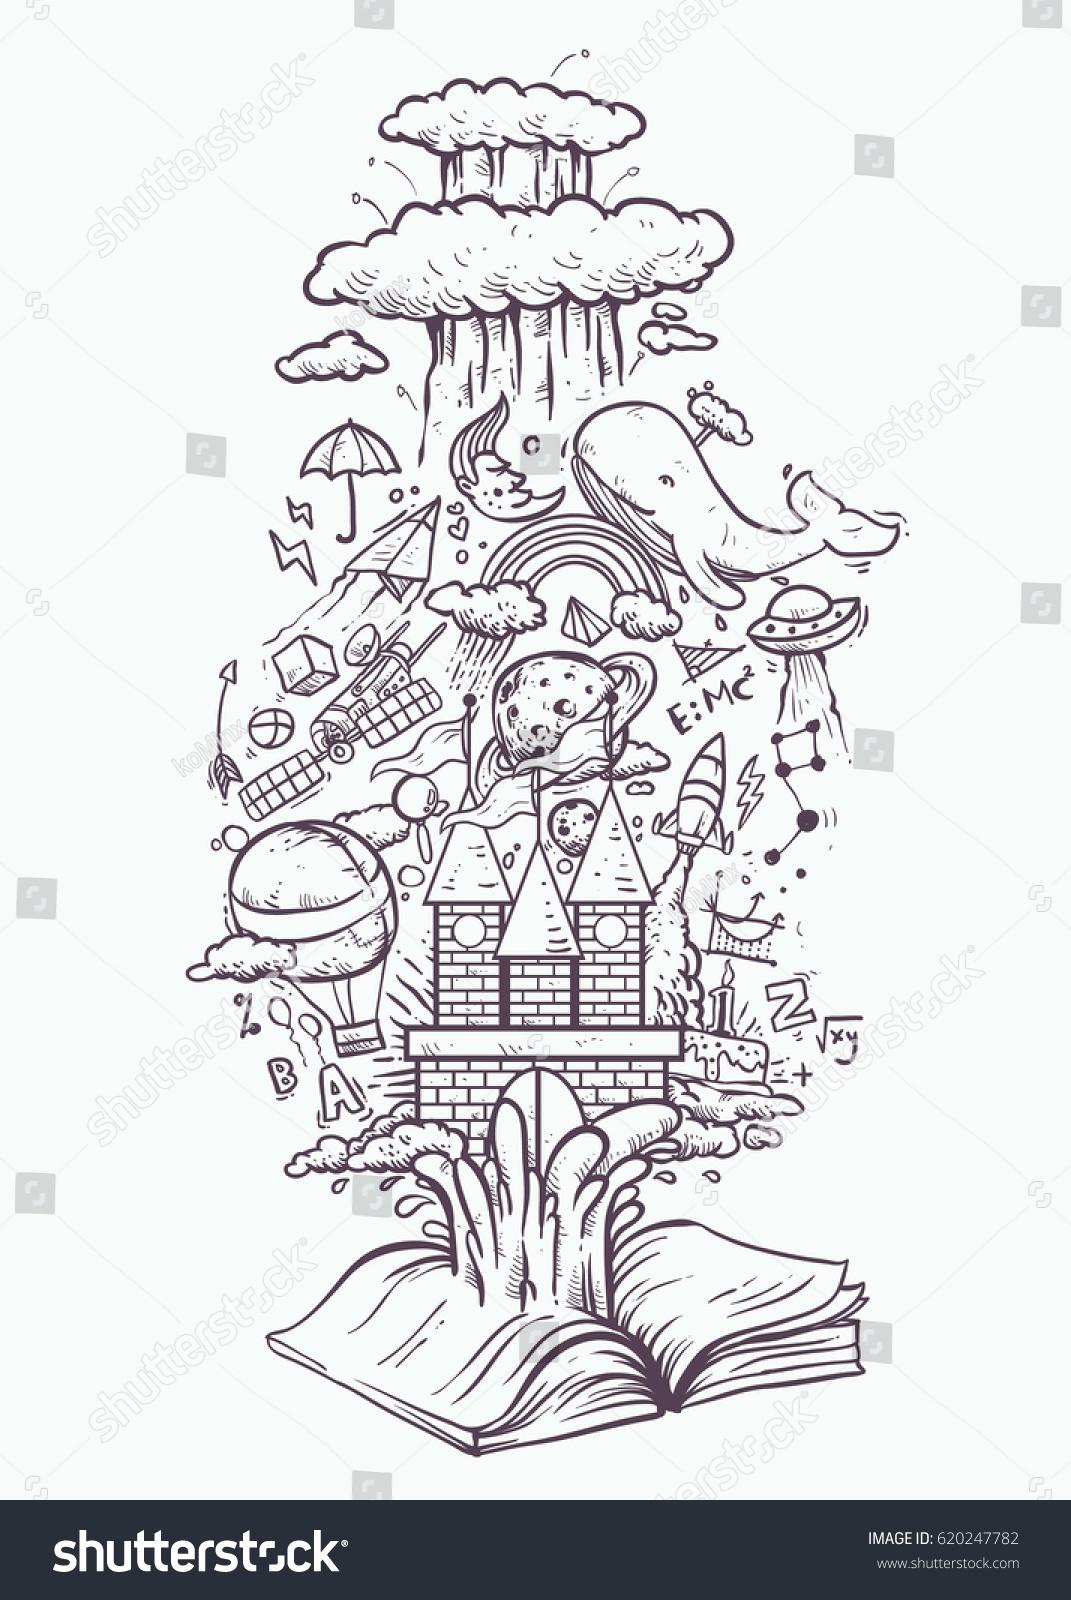 knowledge imagination fantasy book drawing black stock vector